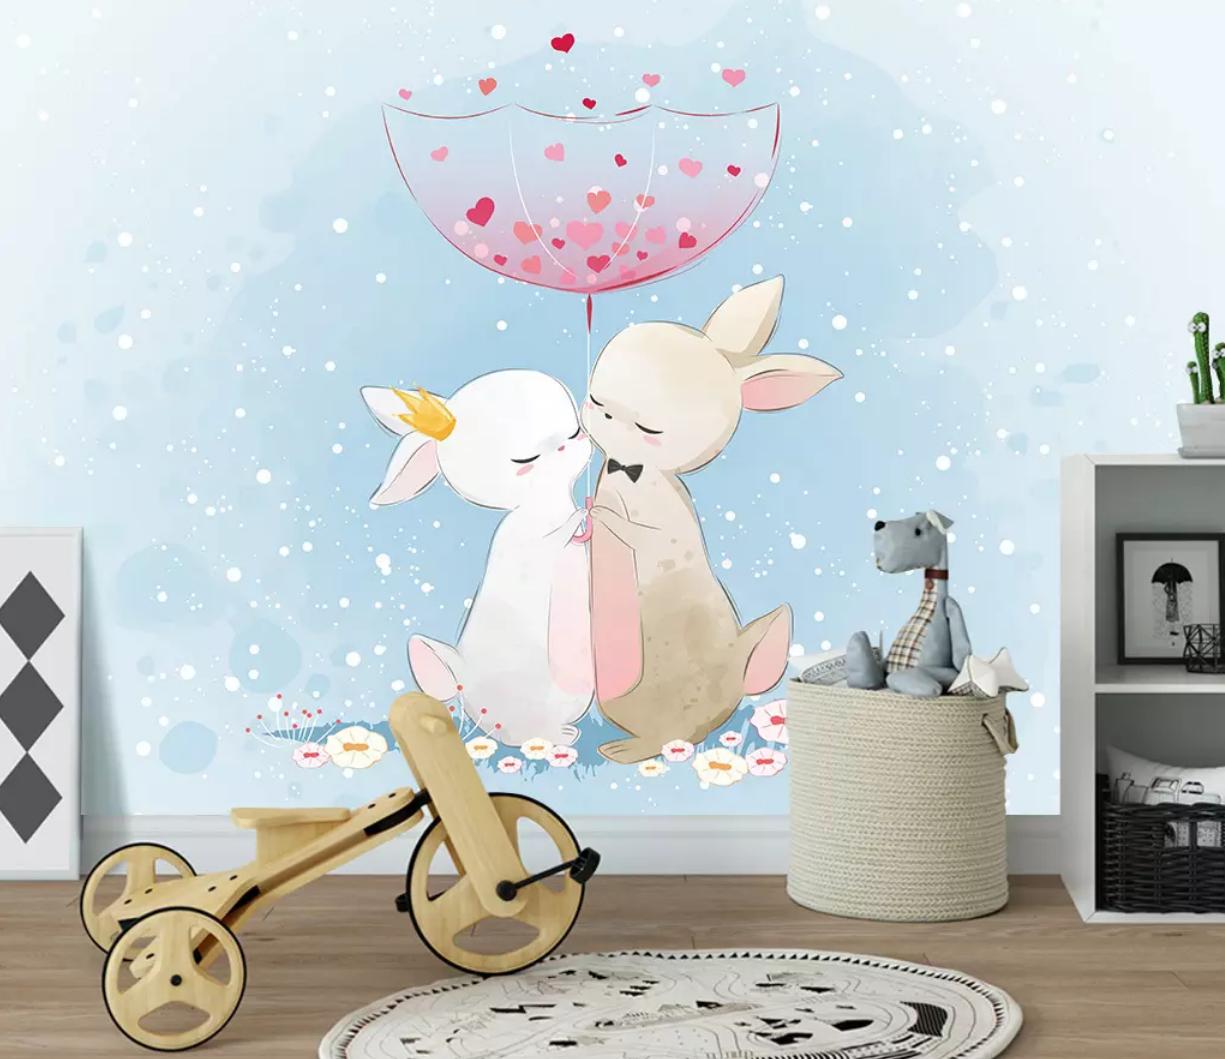 3D Loving Rabbit I2582 Wallpaper Mural Sefl-adhesive Removable Sticker Wendy